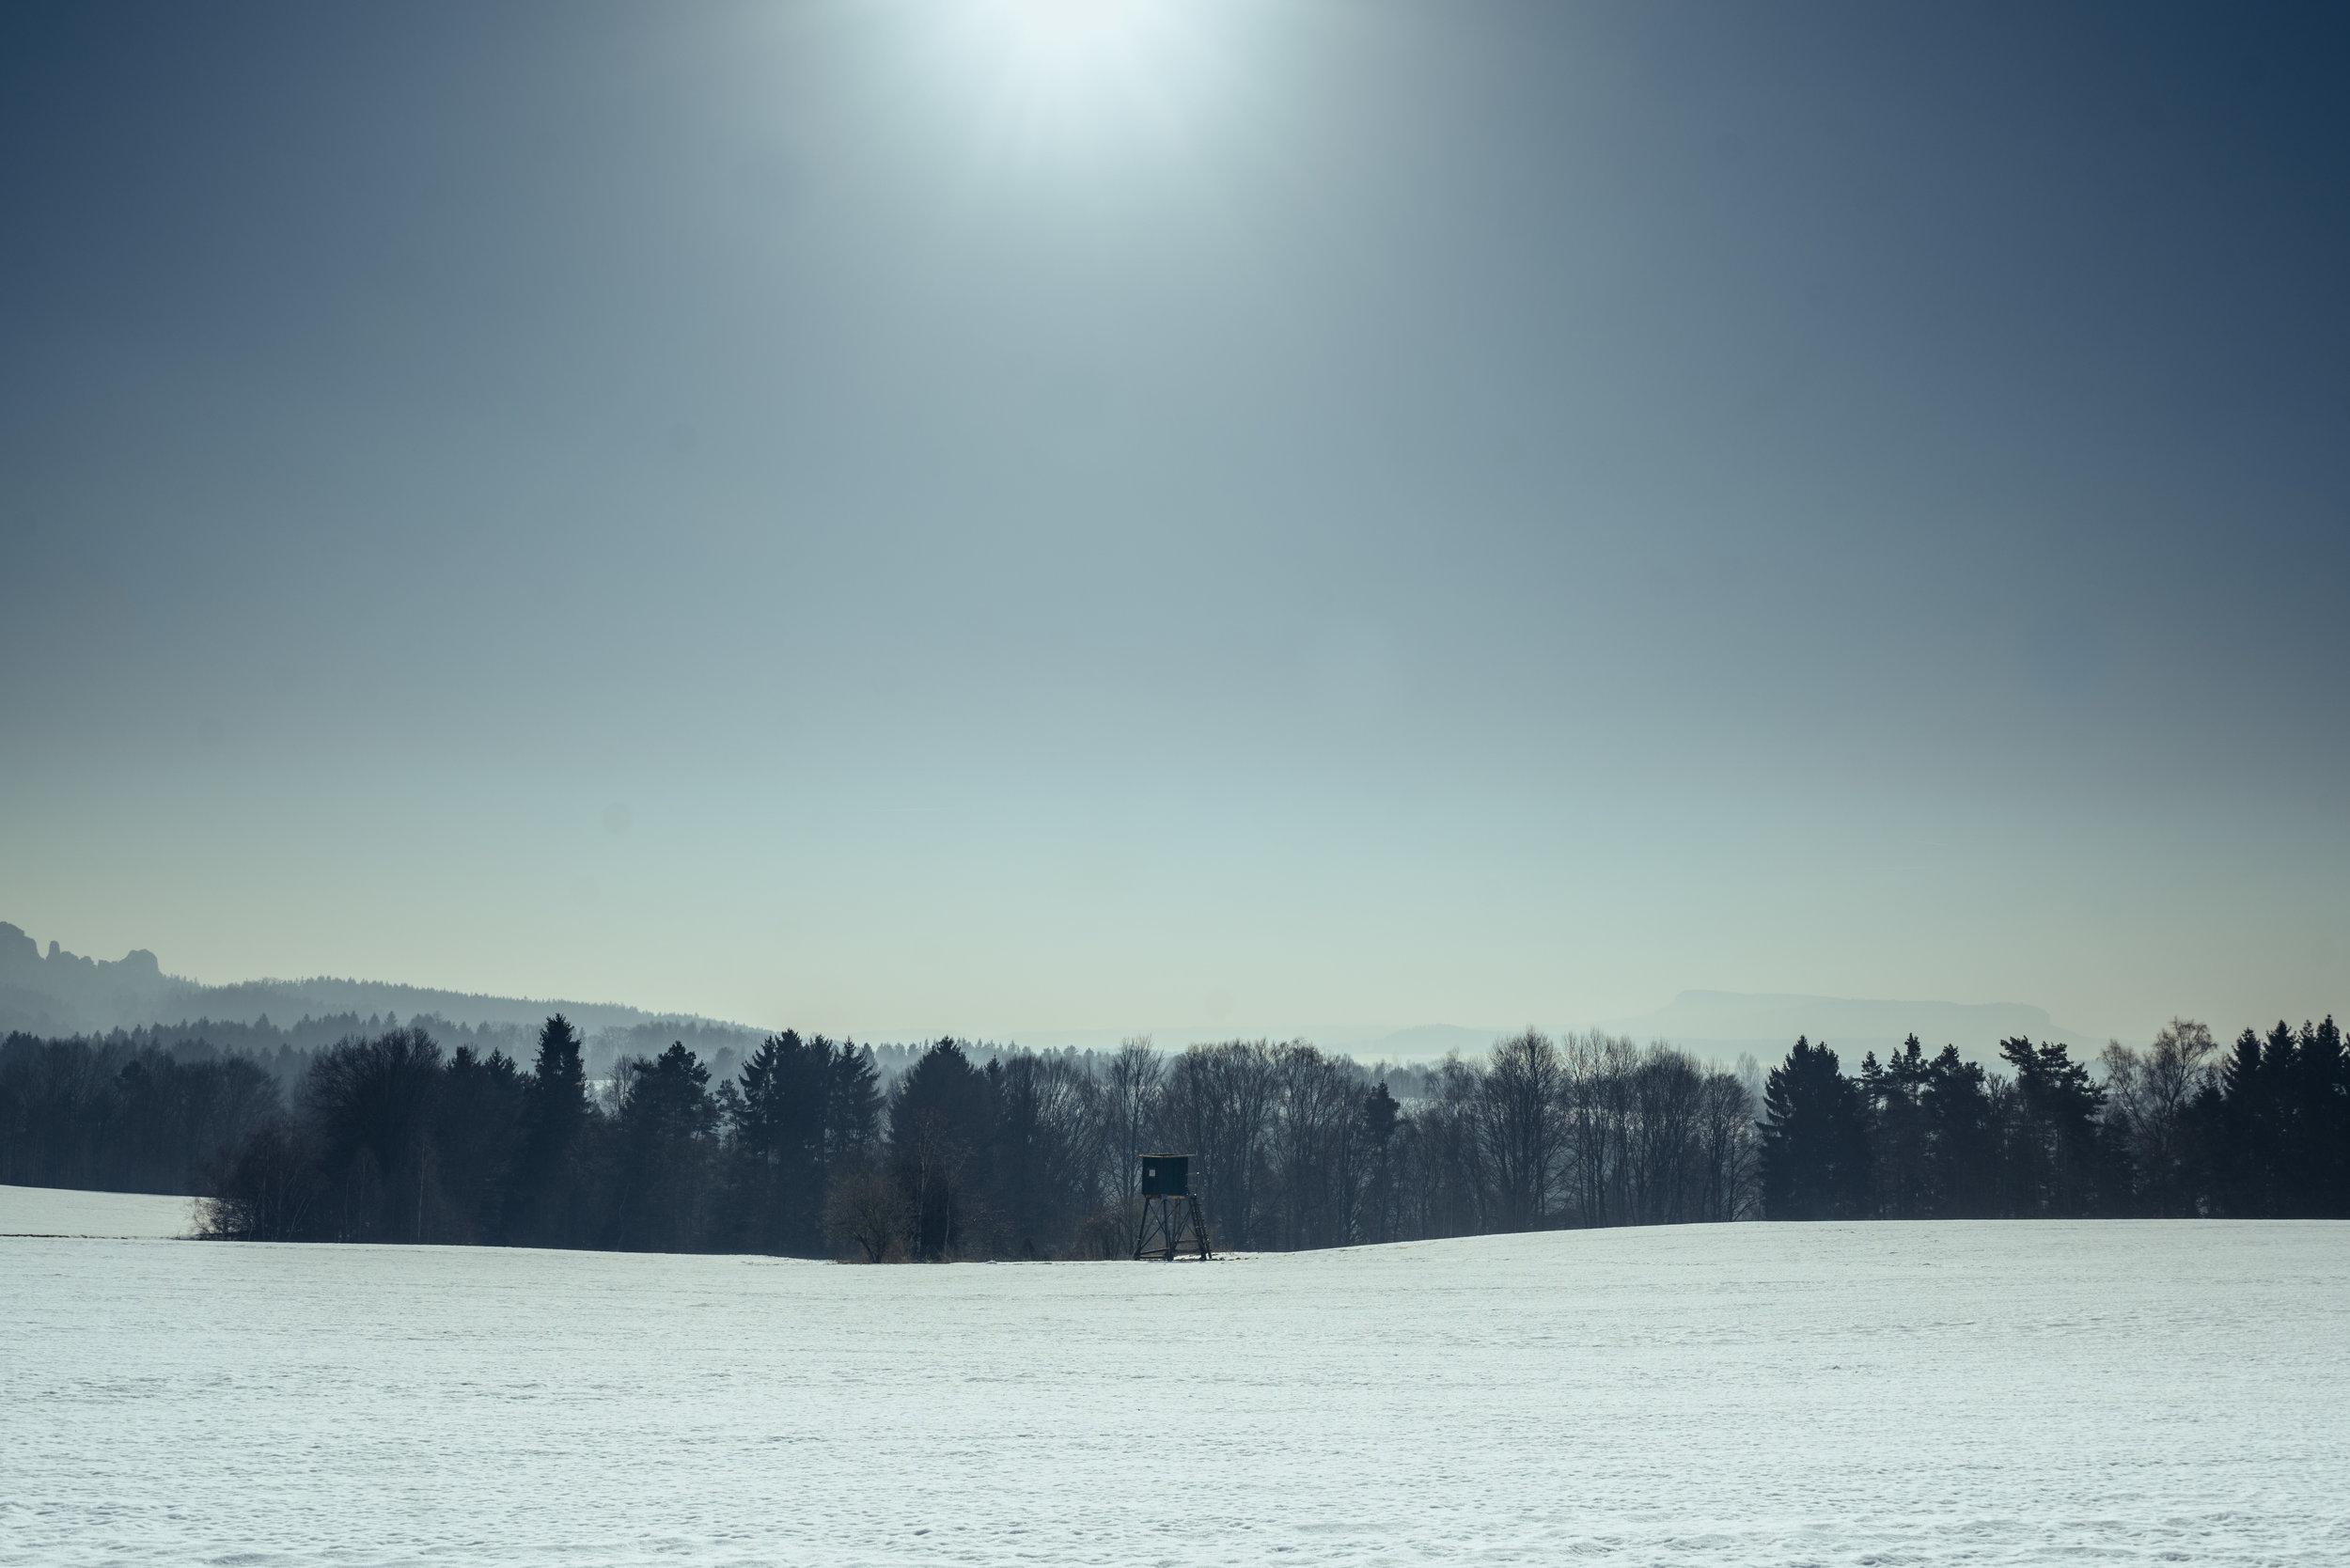 Distant mountains in Saxon Switzerland National Park